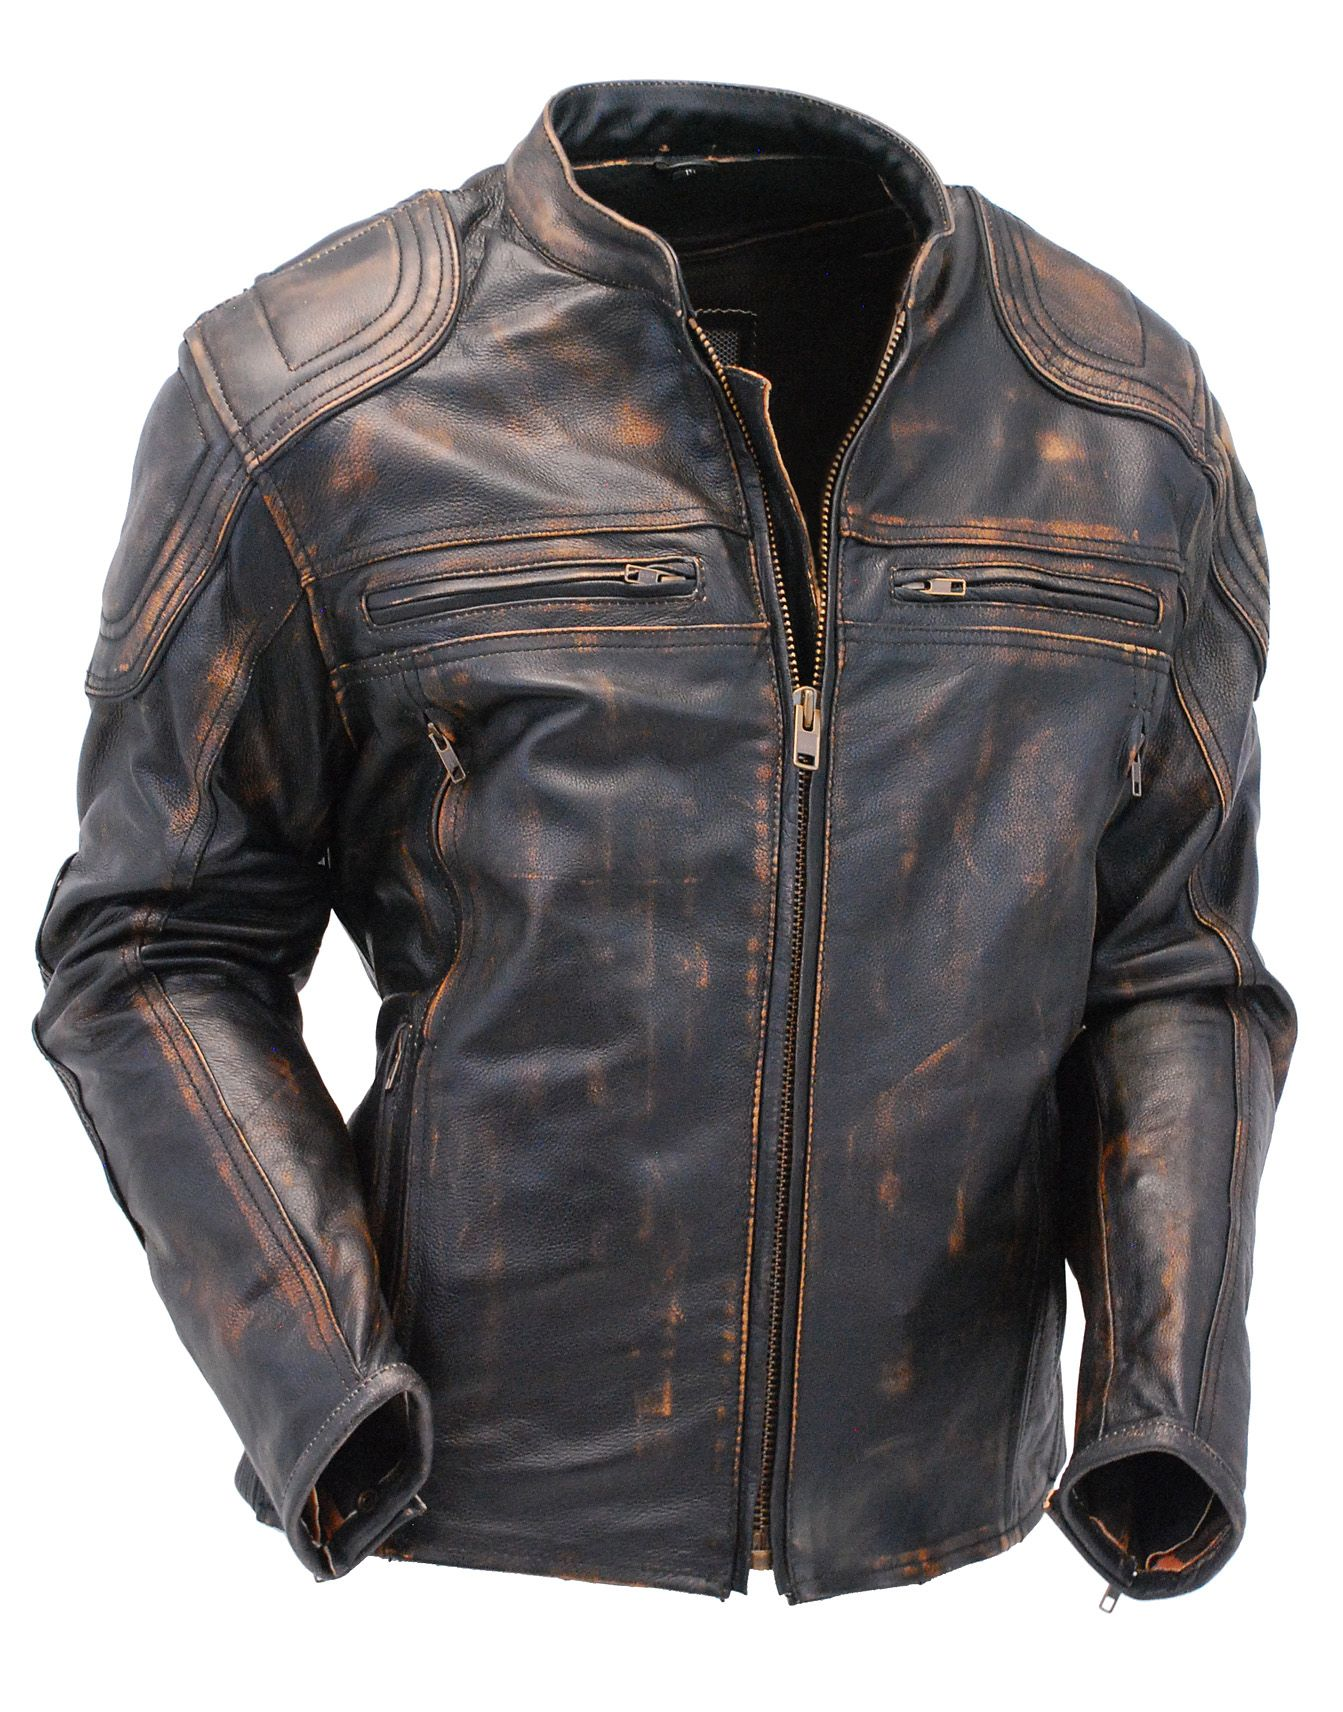 Men S Ccw Vented Vintage Brown Leather Racer Jacket W Reflectors Ma6611vzgn Leather Jacket Men Style Leather Jacket Best Leather Jackets [ 1712 x 1343 Pixel ]